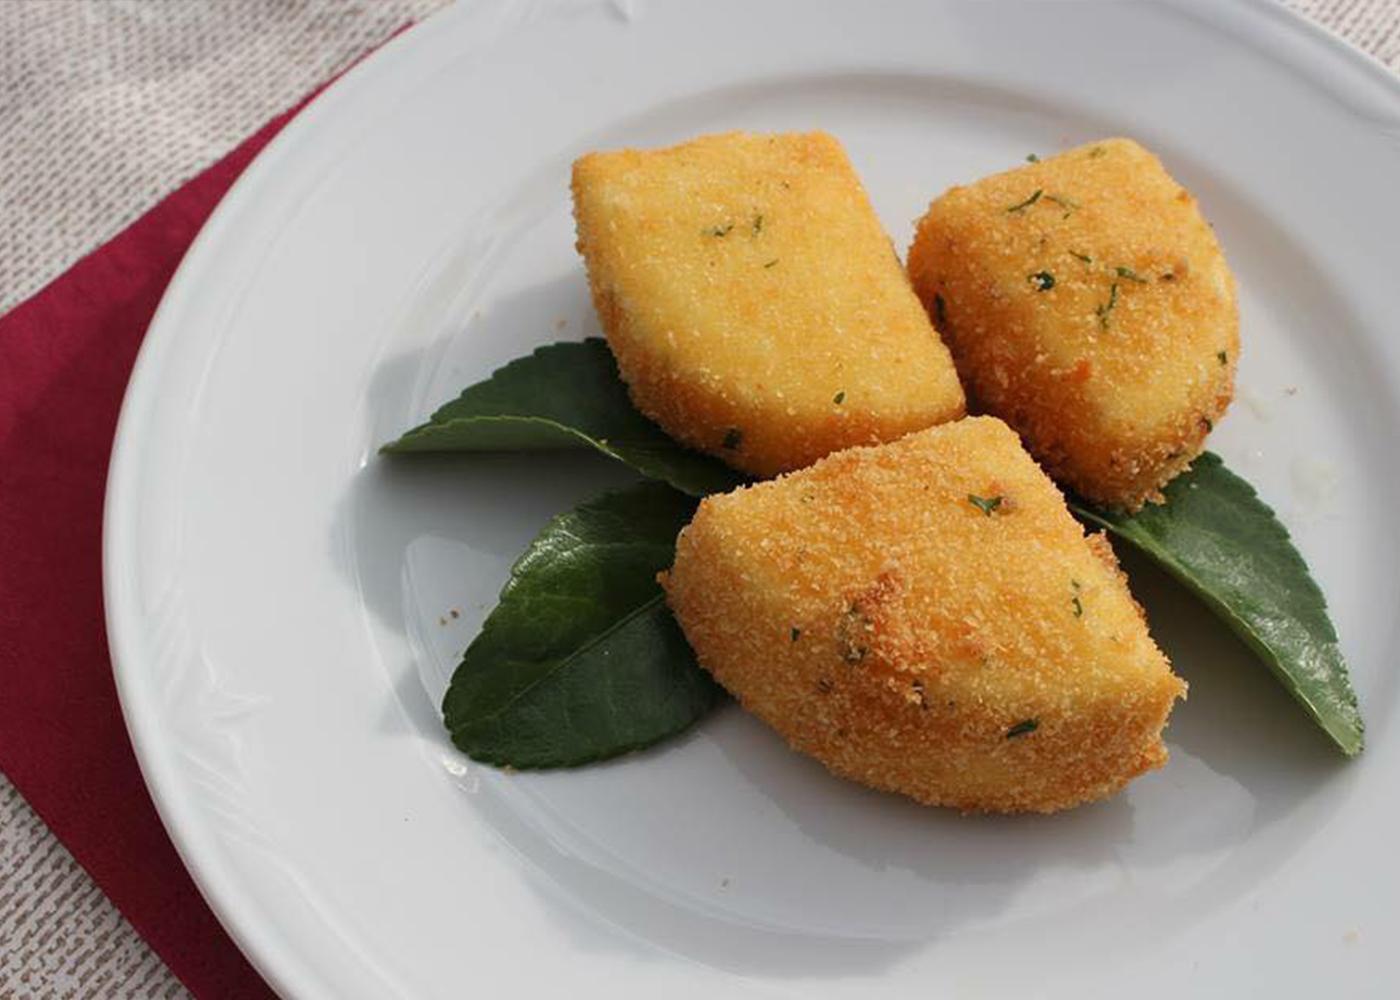 Ricotta fritta ricetta siciliana